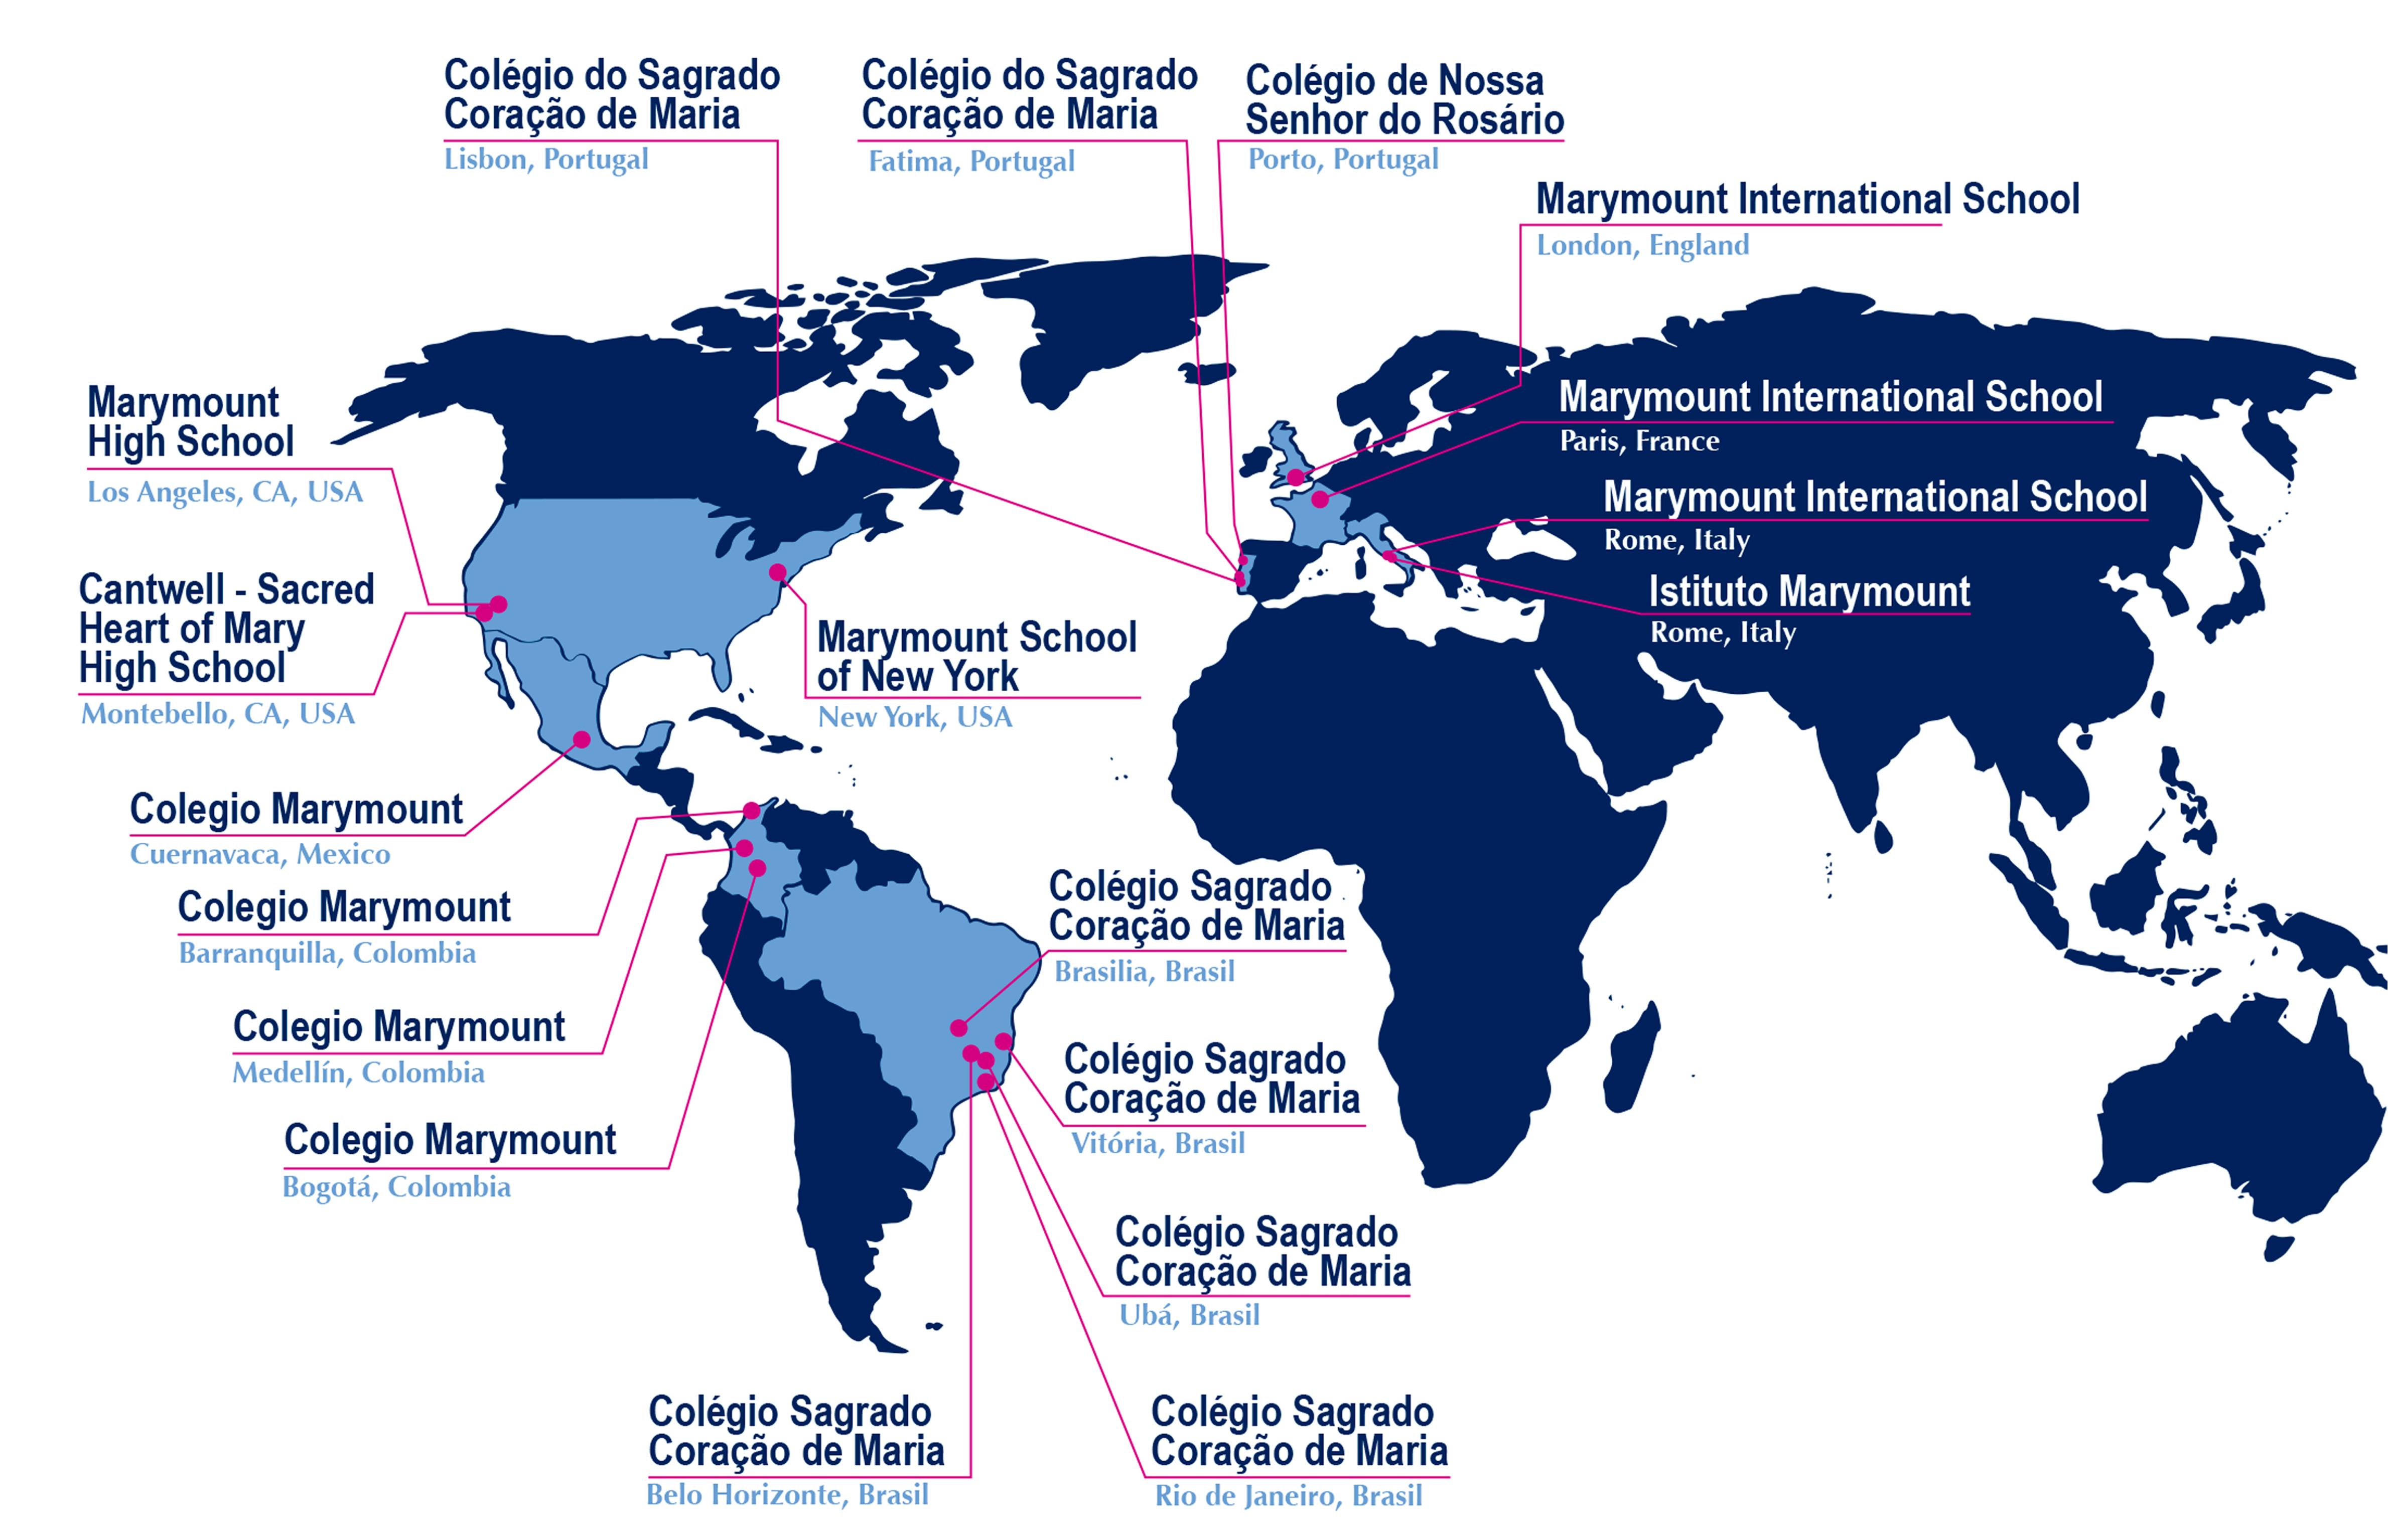 Rede de Colégios IRSCM